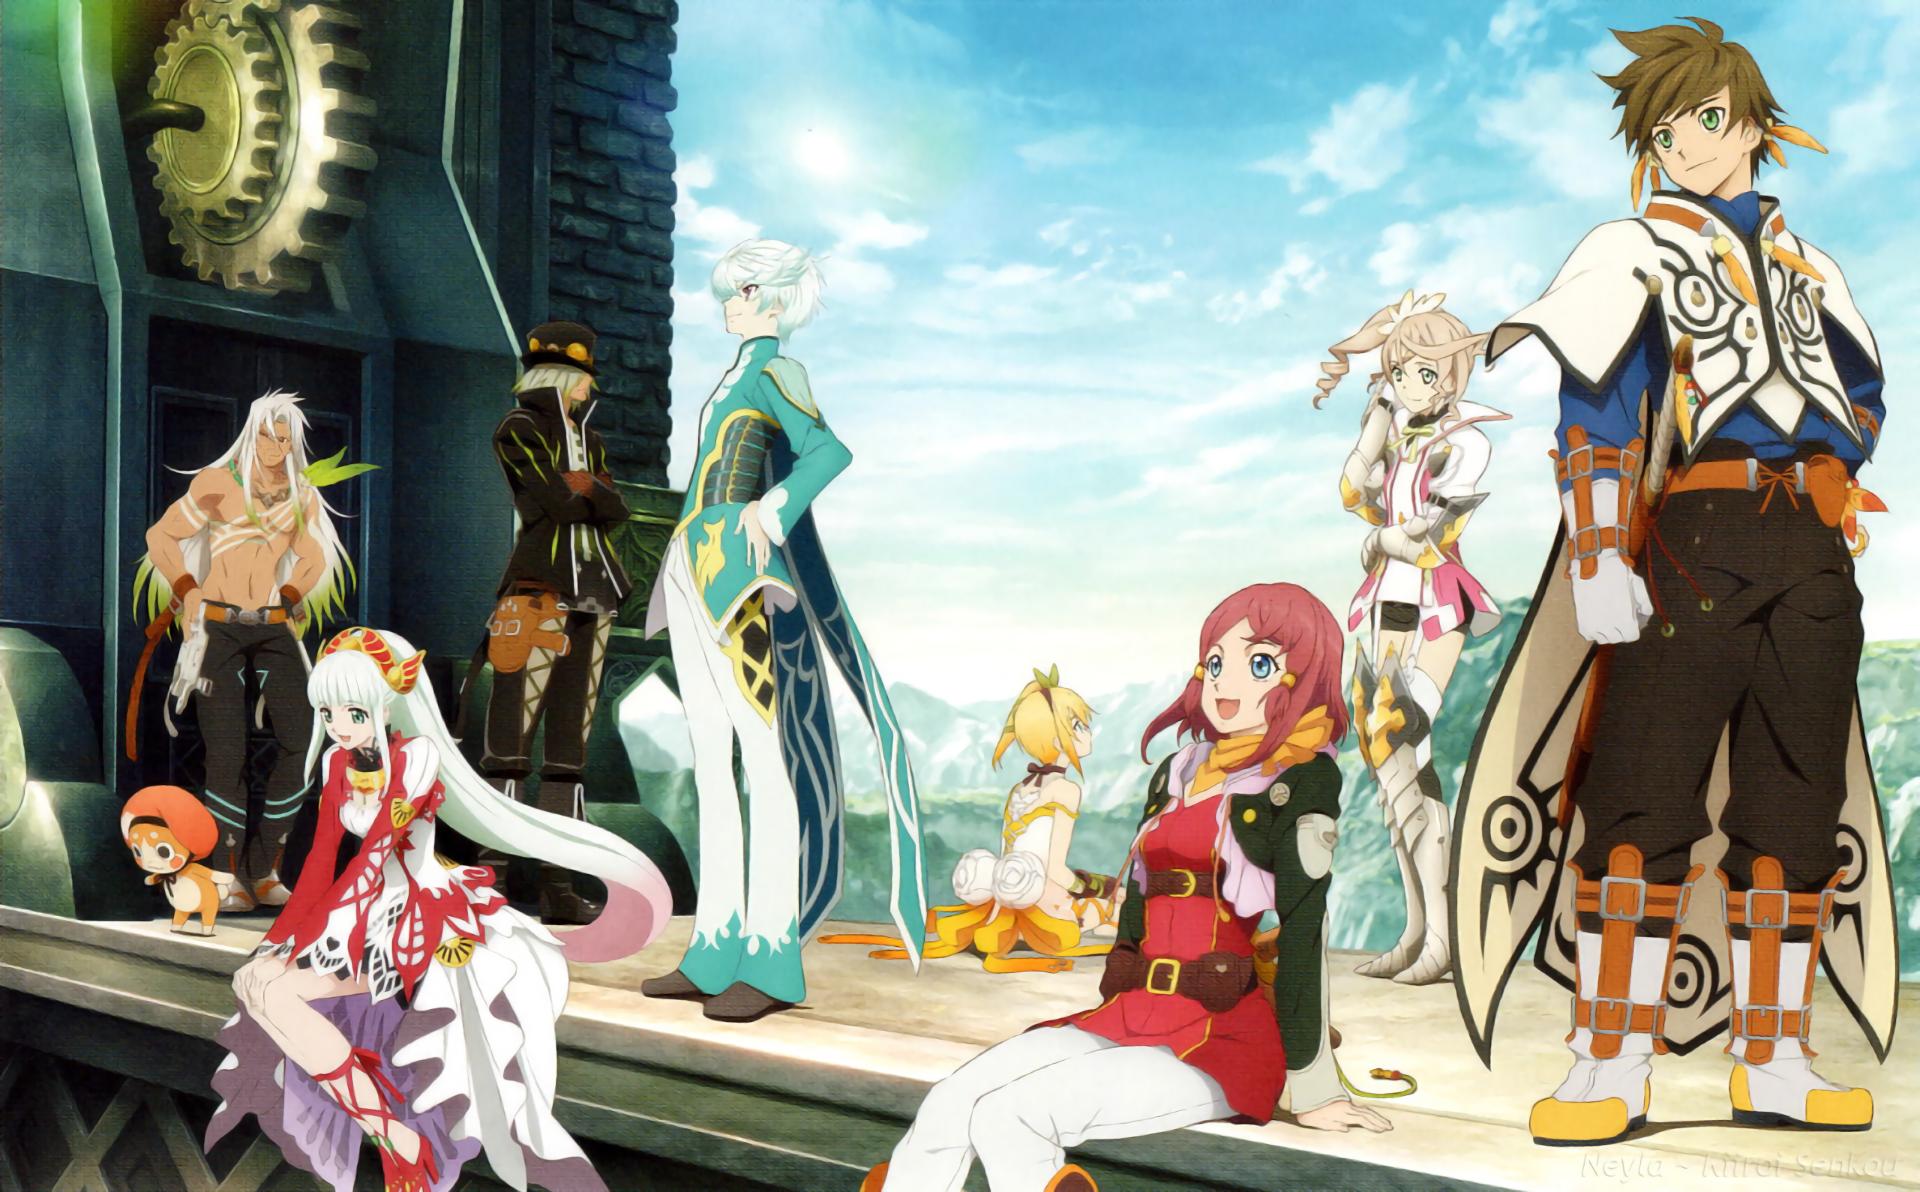 Anime Tales Of Zestiria The X Alisha Diphda Sorey Zestiria Dezel Zestiria Edna Zestiria Lailah Ze Tales Of Zestiria Tales Of Berseria Tales Of Vesperia